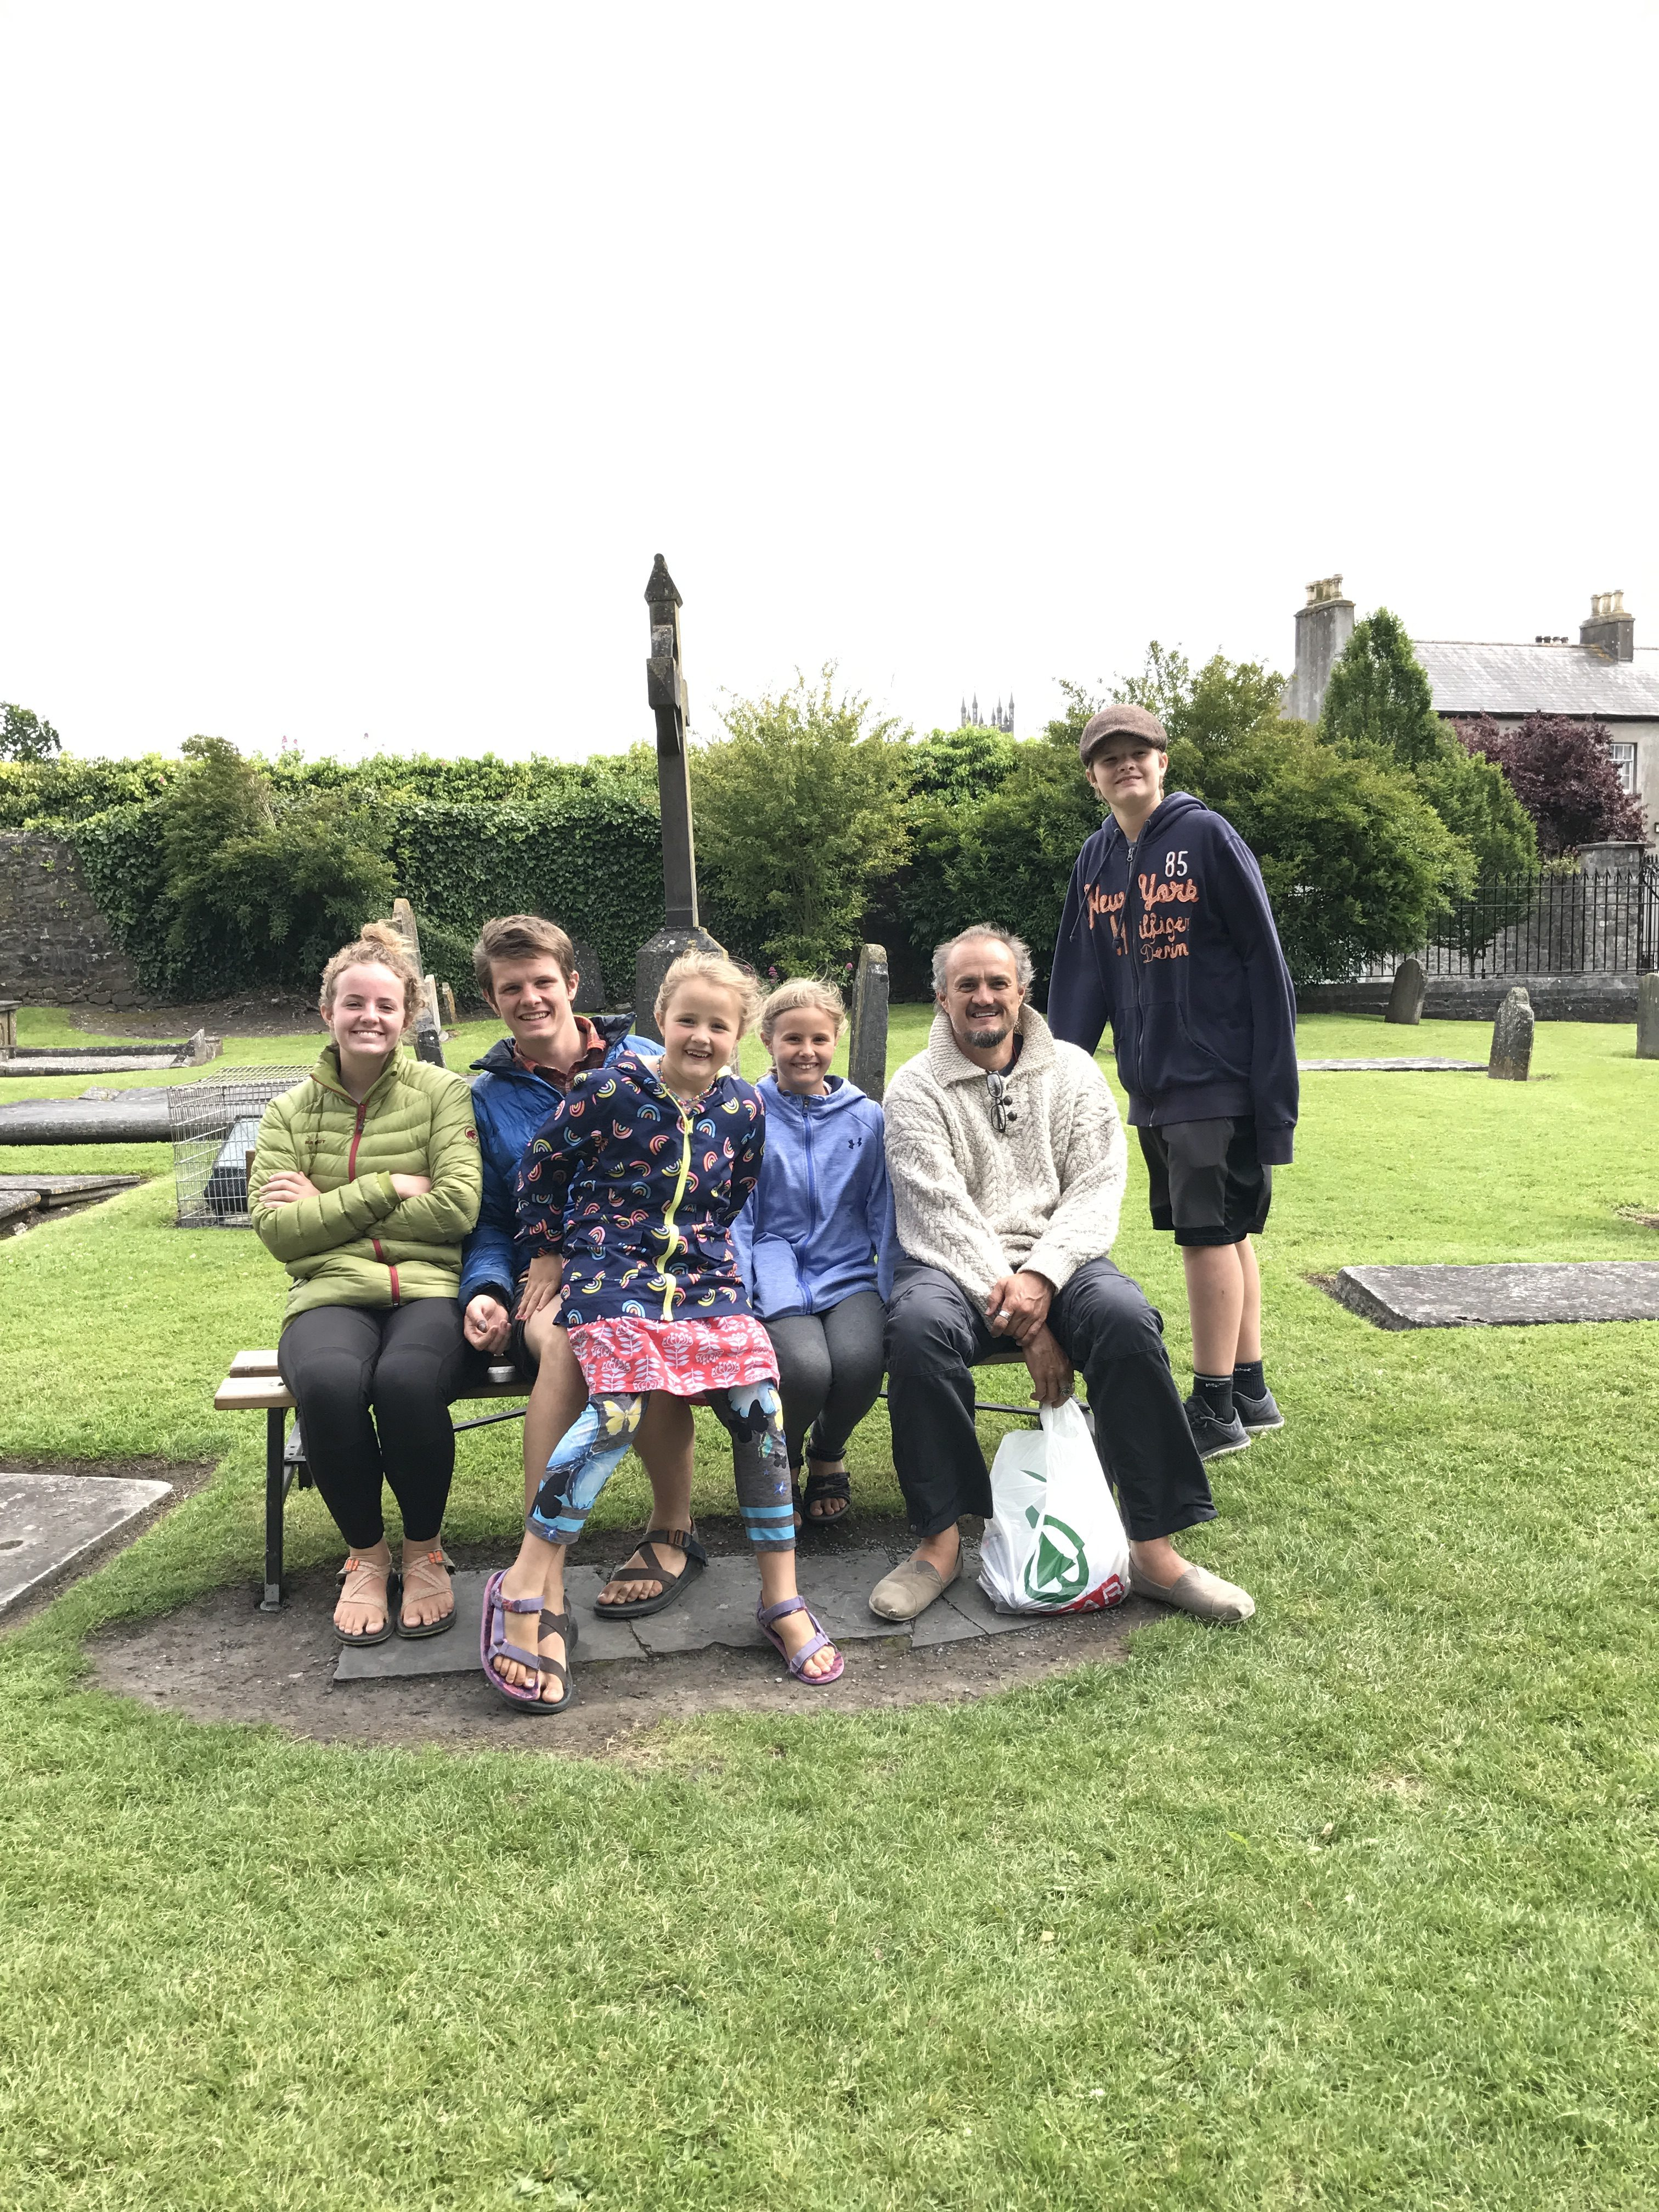 European Family Camping